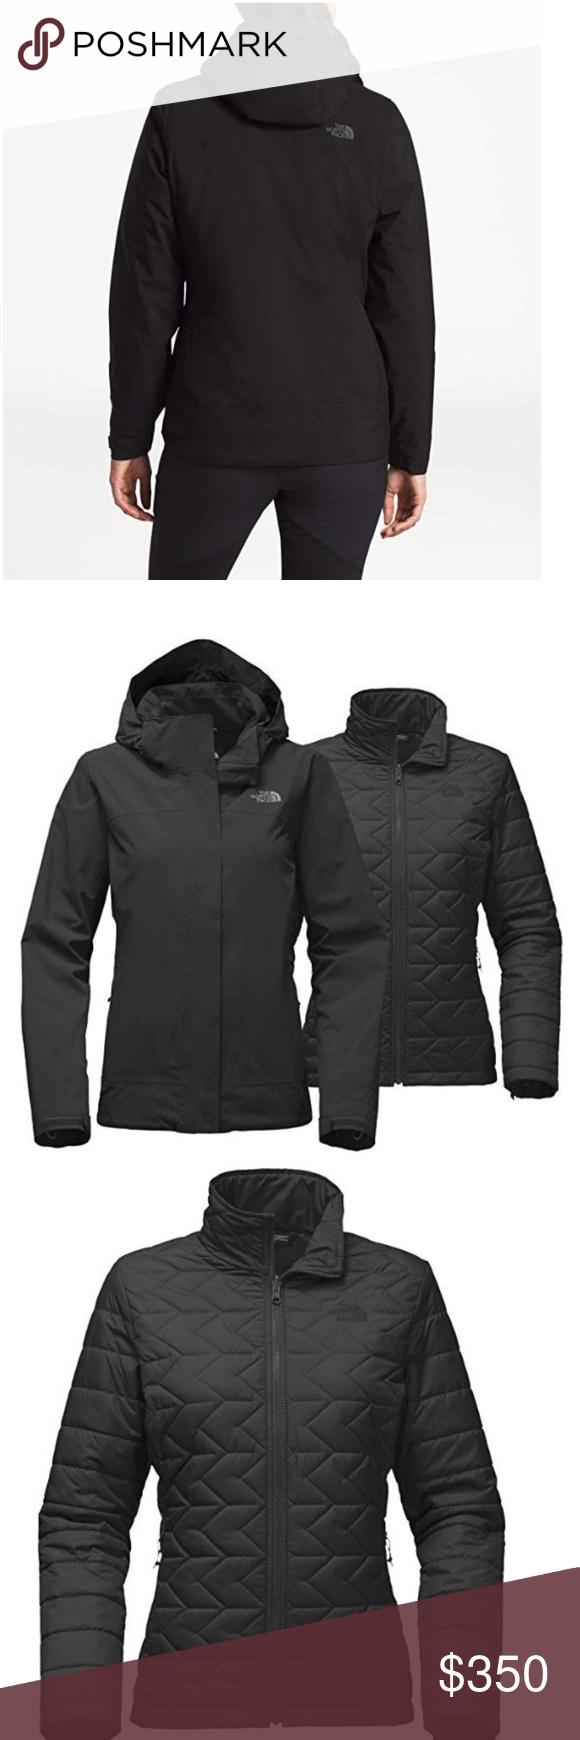 The North Face Women S Carto Triclimate Jacket M Sz Medium Color Black Polyester Polyurethane 3 In 1 Jac North Face Women Ski Pants Women Triclimate Jacket [ 1740 x 580 Pixel ]